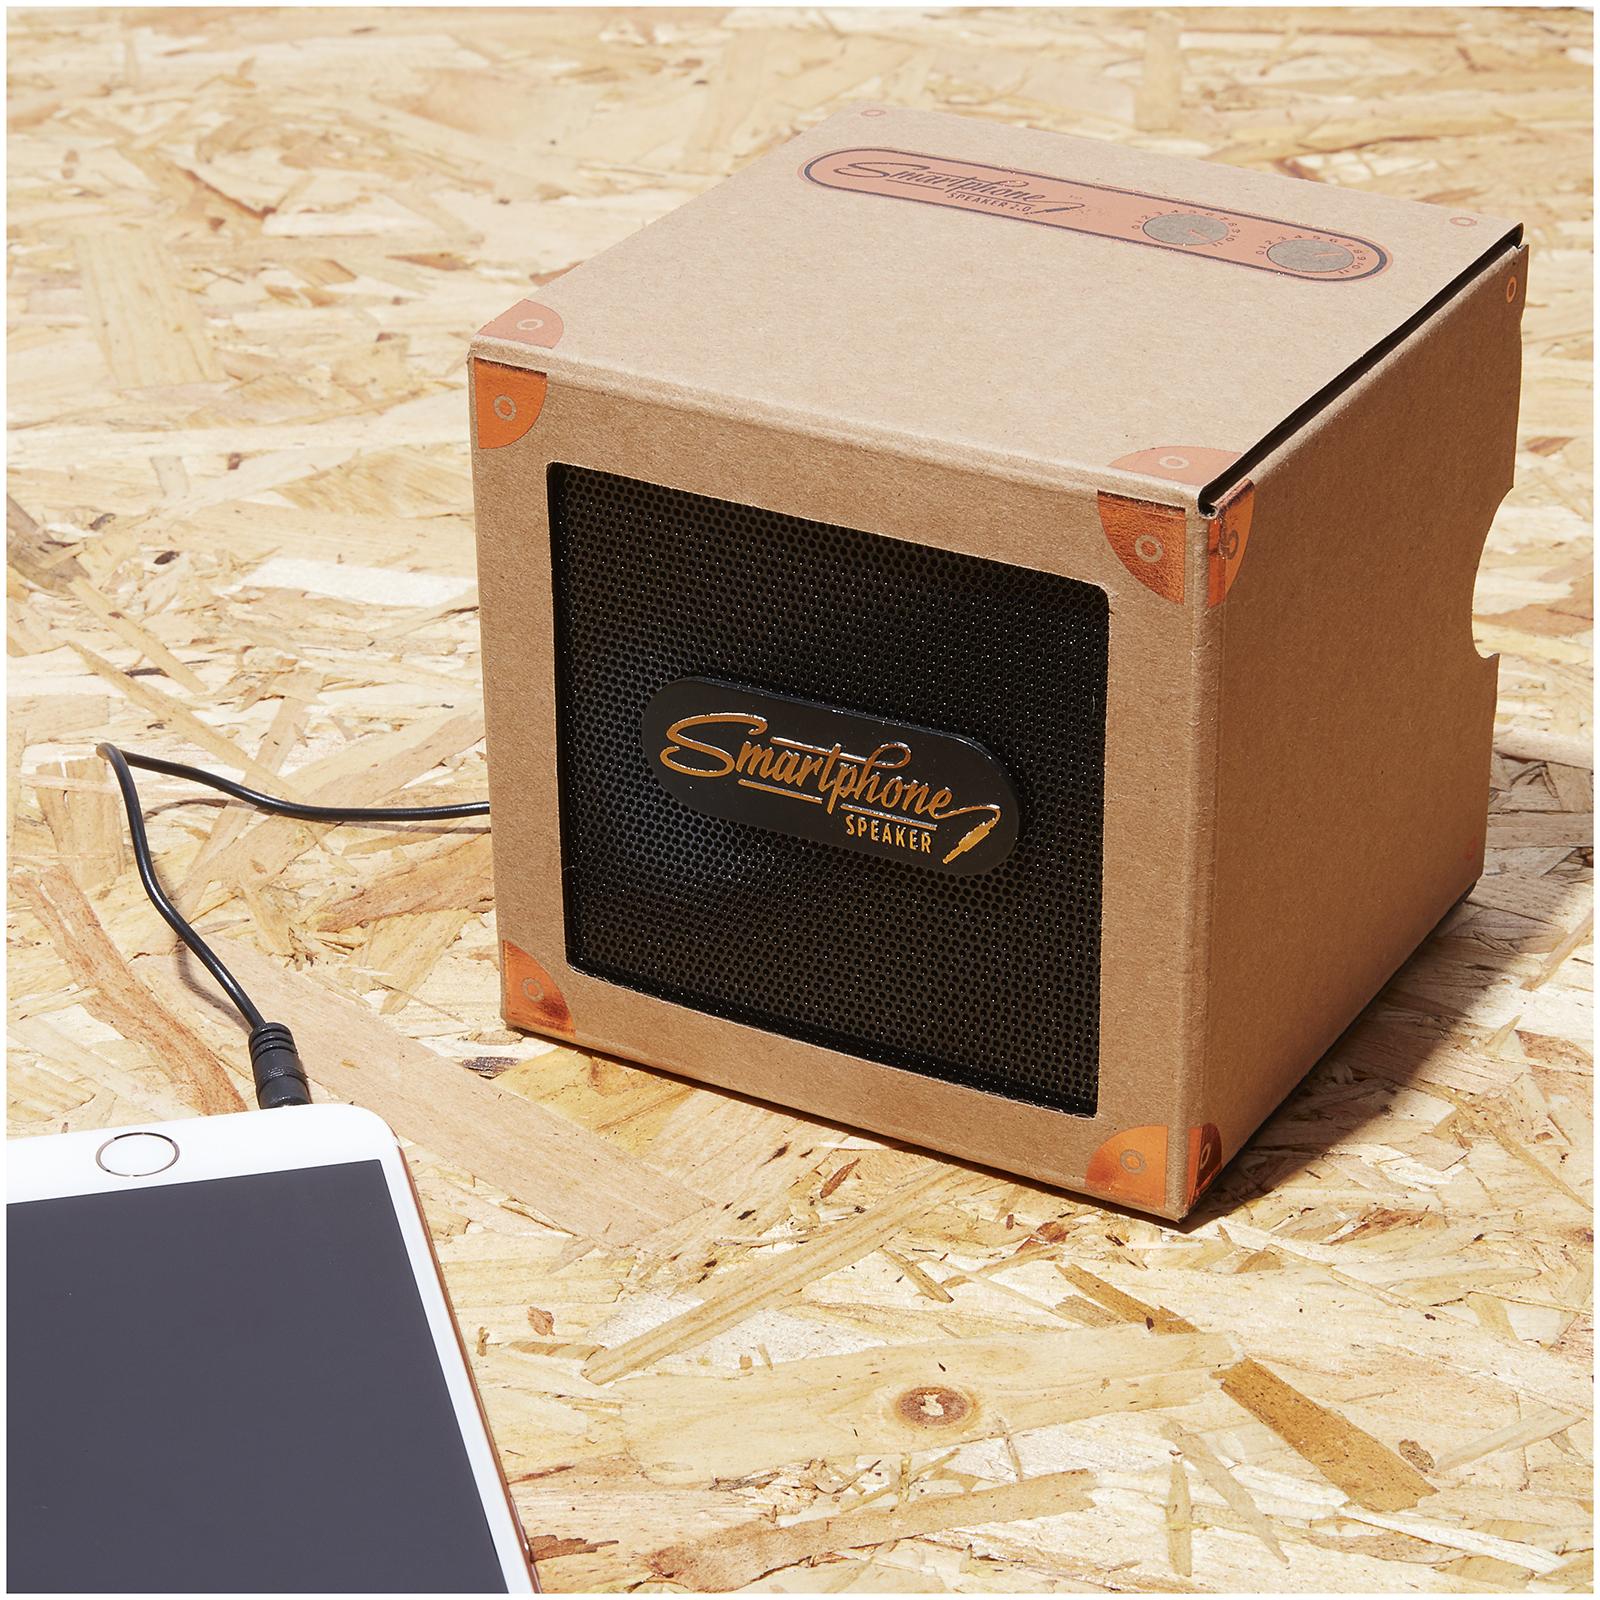 Image of Smartphone Speaker 2.0 - Copper